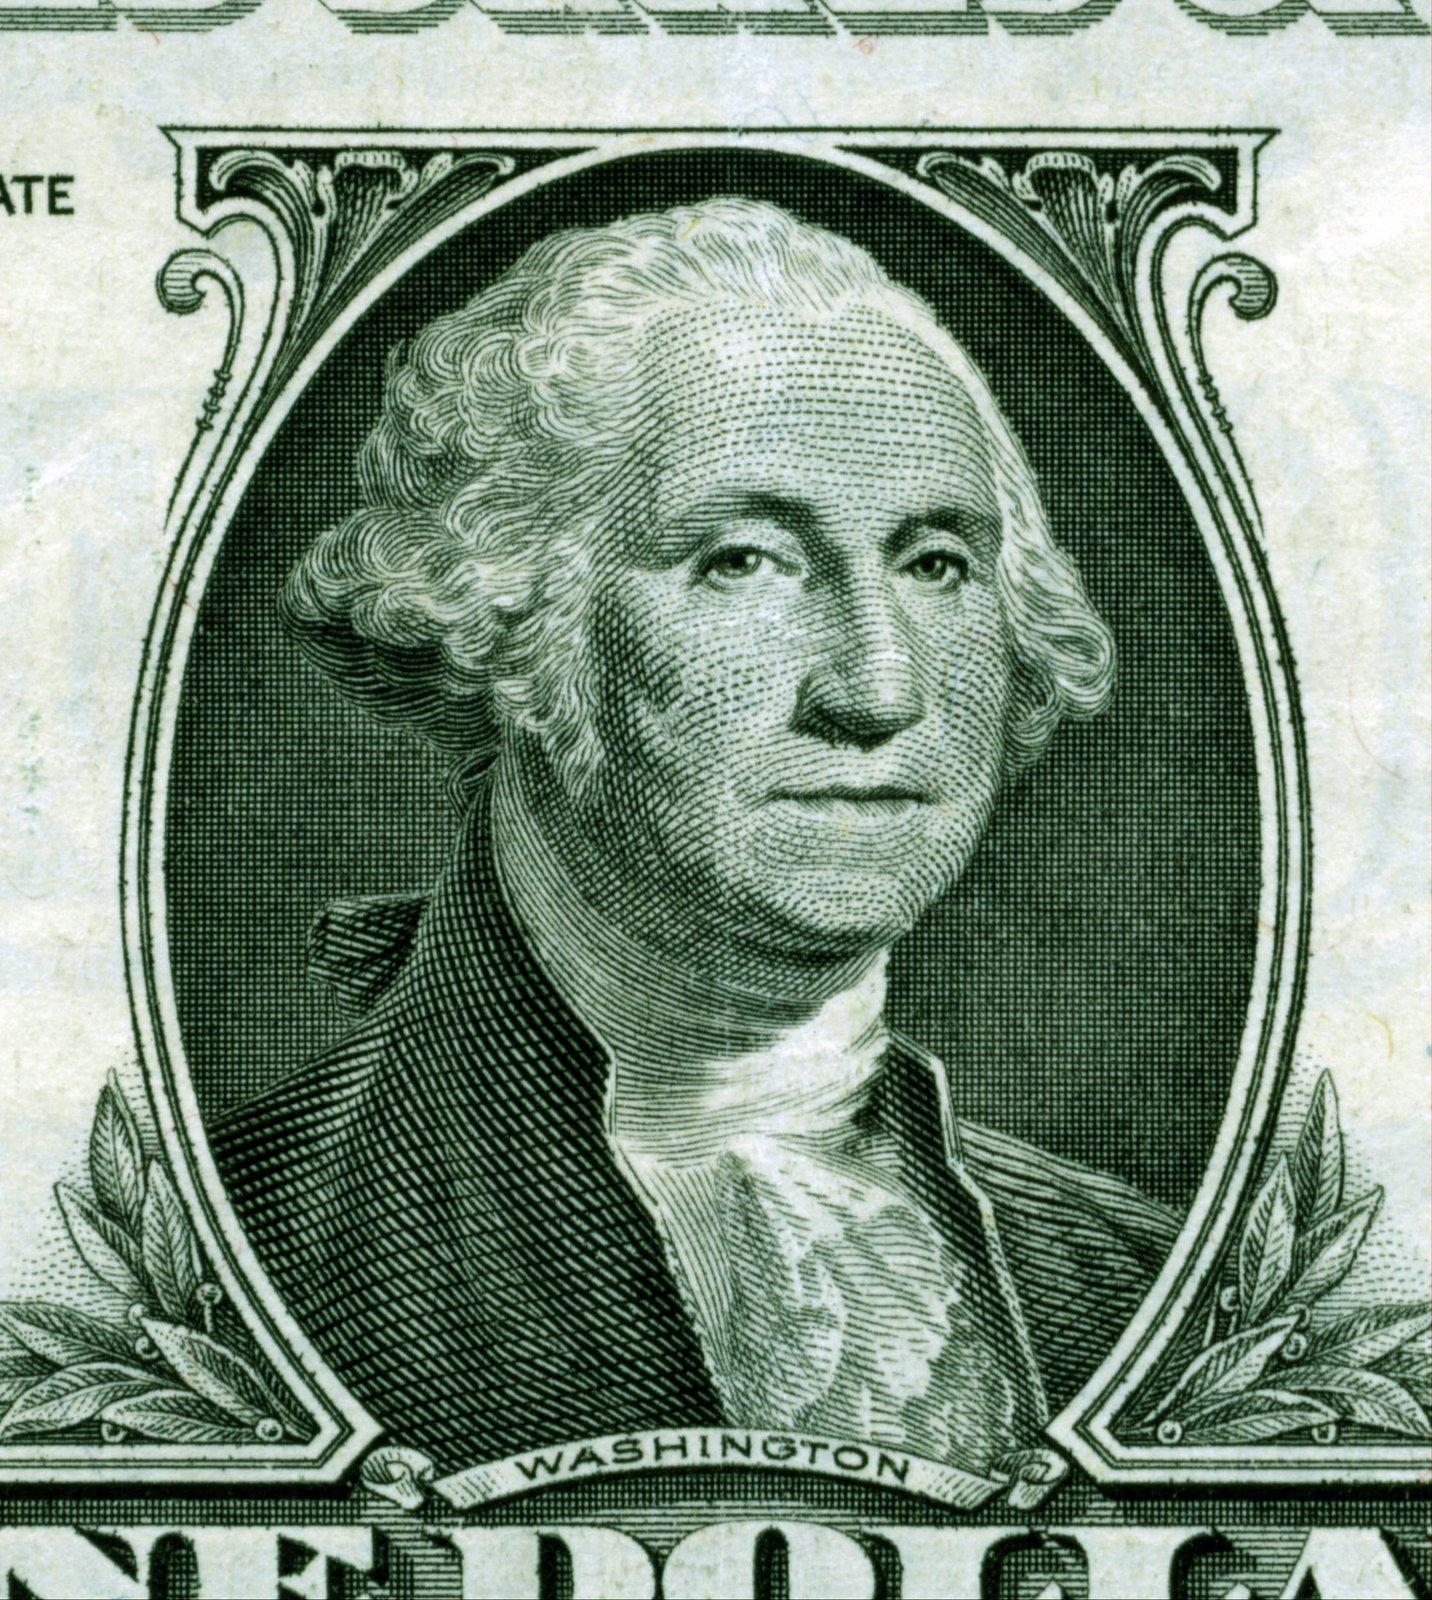 Take George Washington Off The One Dollar Bill